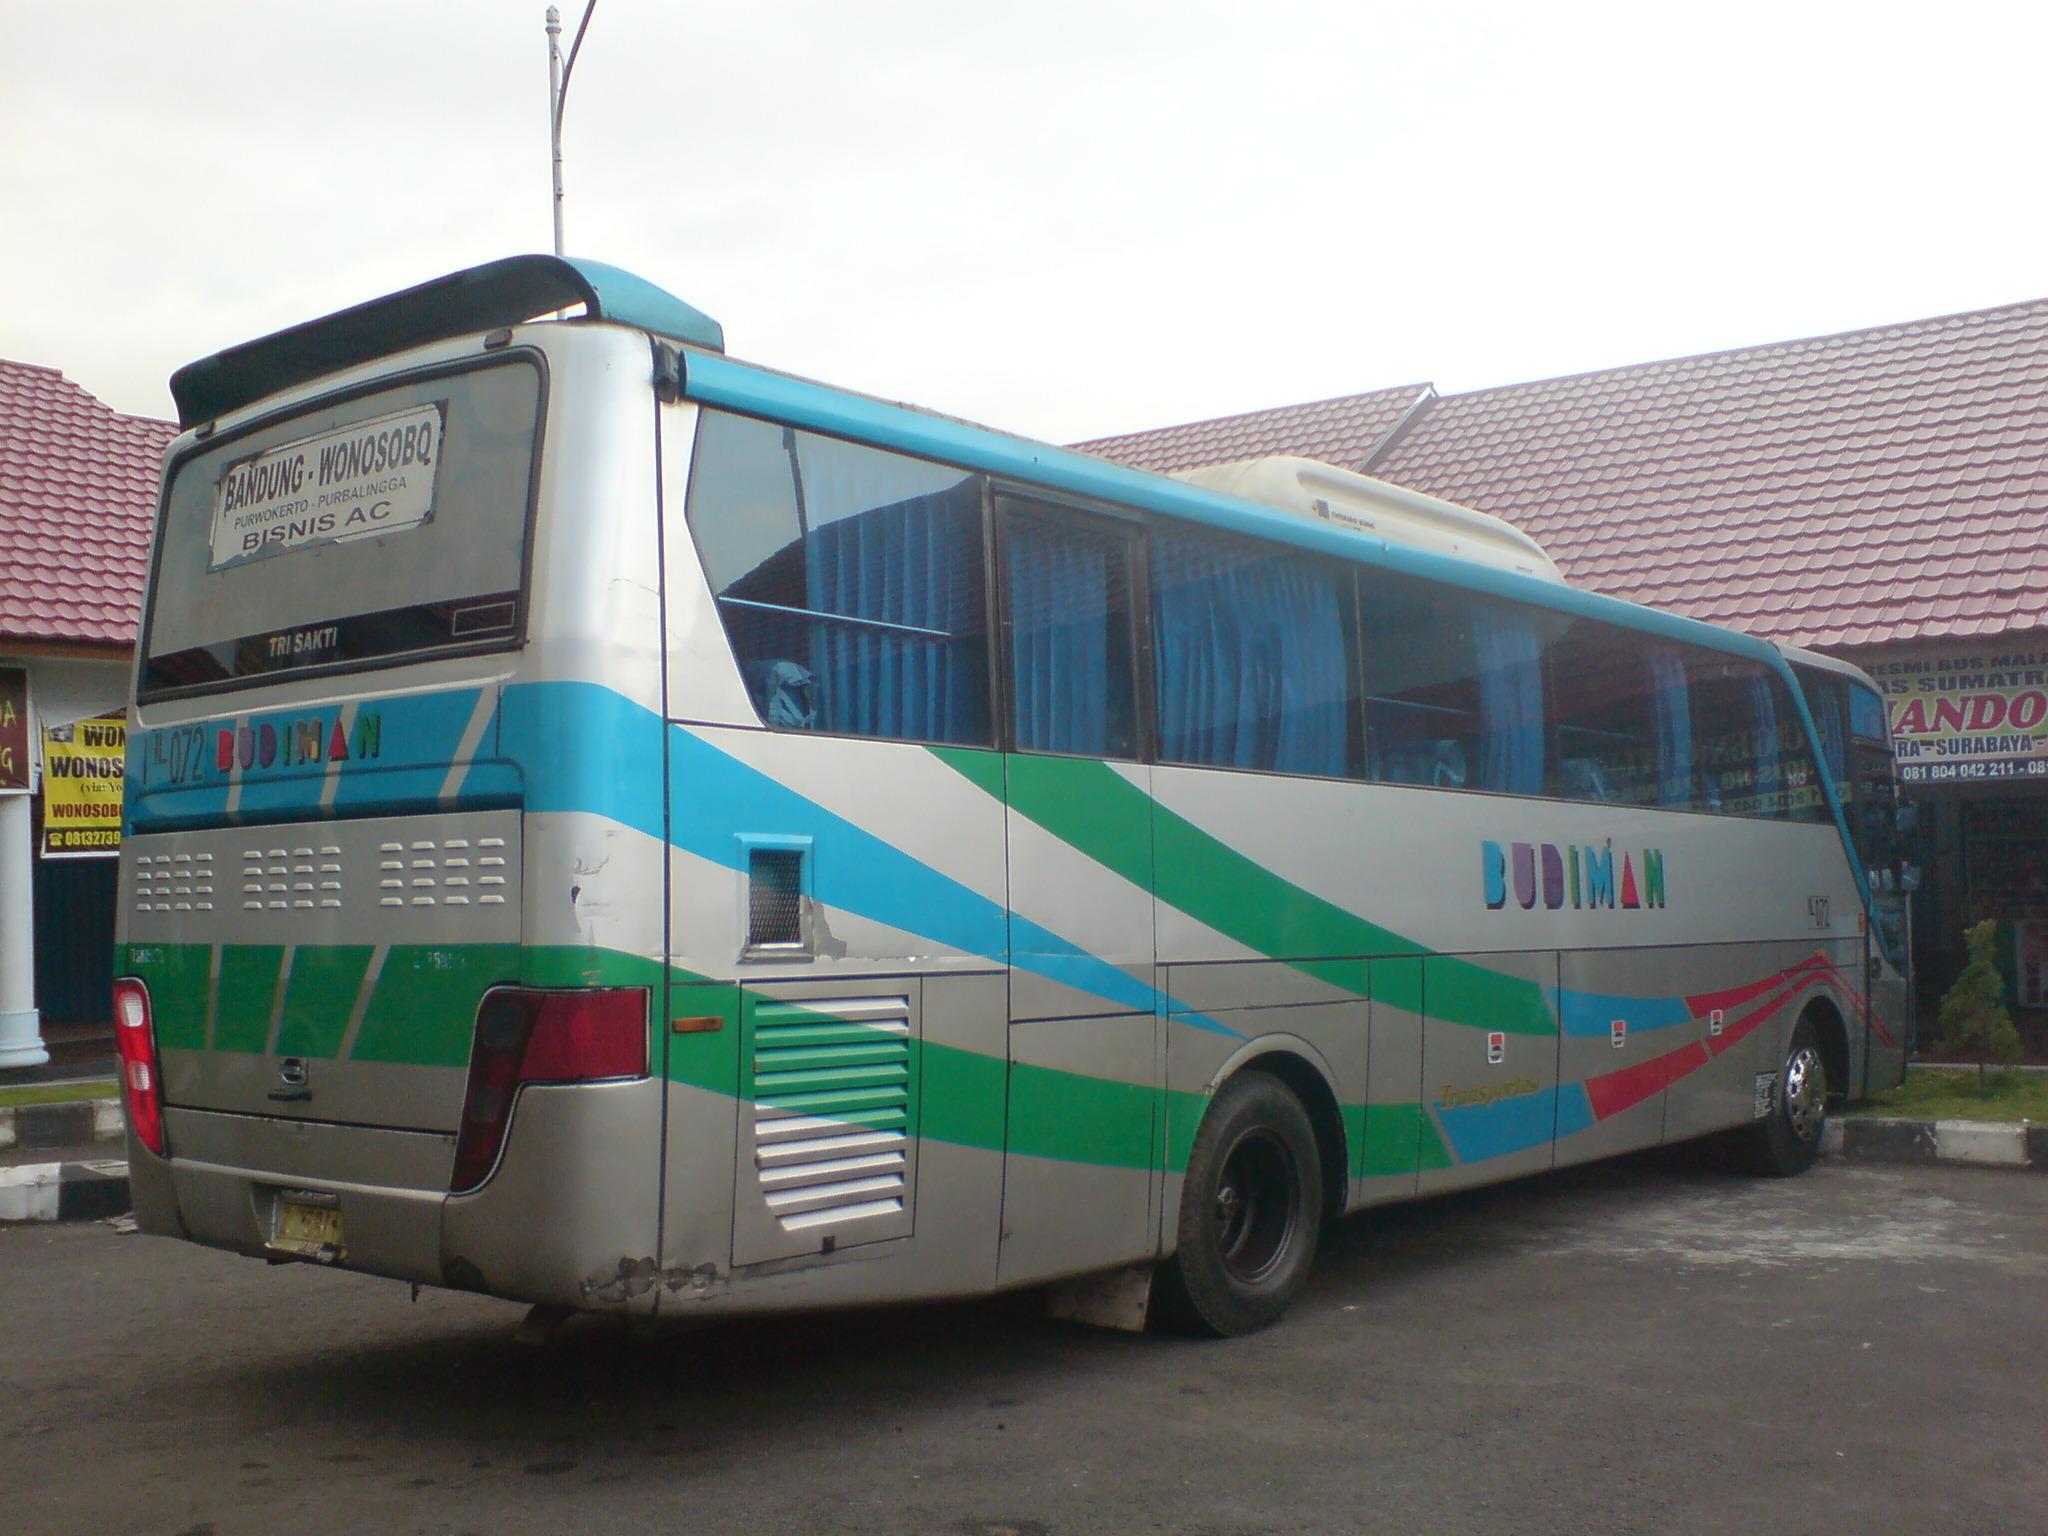 kumpulan modifikasi mobil bus indonesia 2018 modifikasi mobil avanza. Black Bedroom Furniture Sets. Home Design Ideas